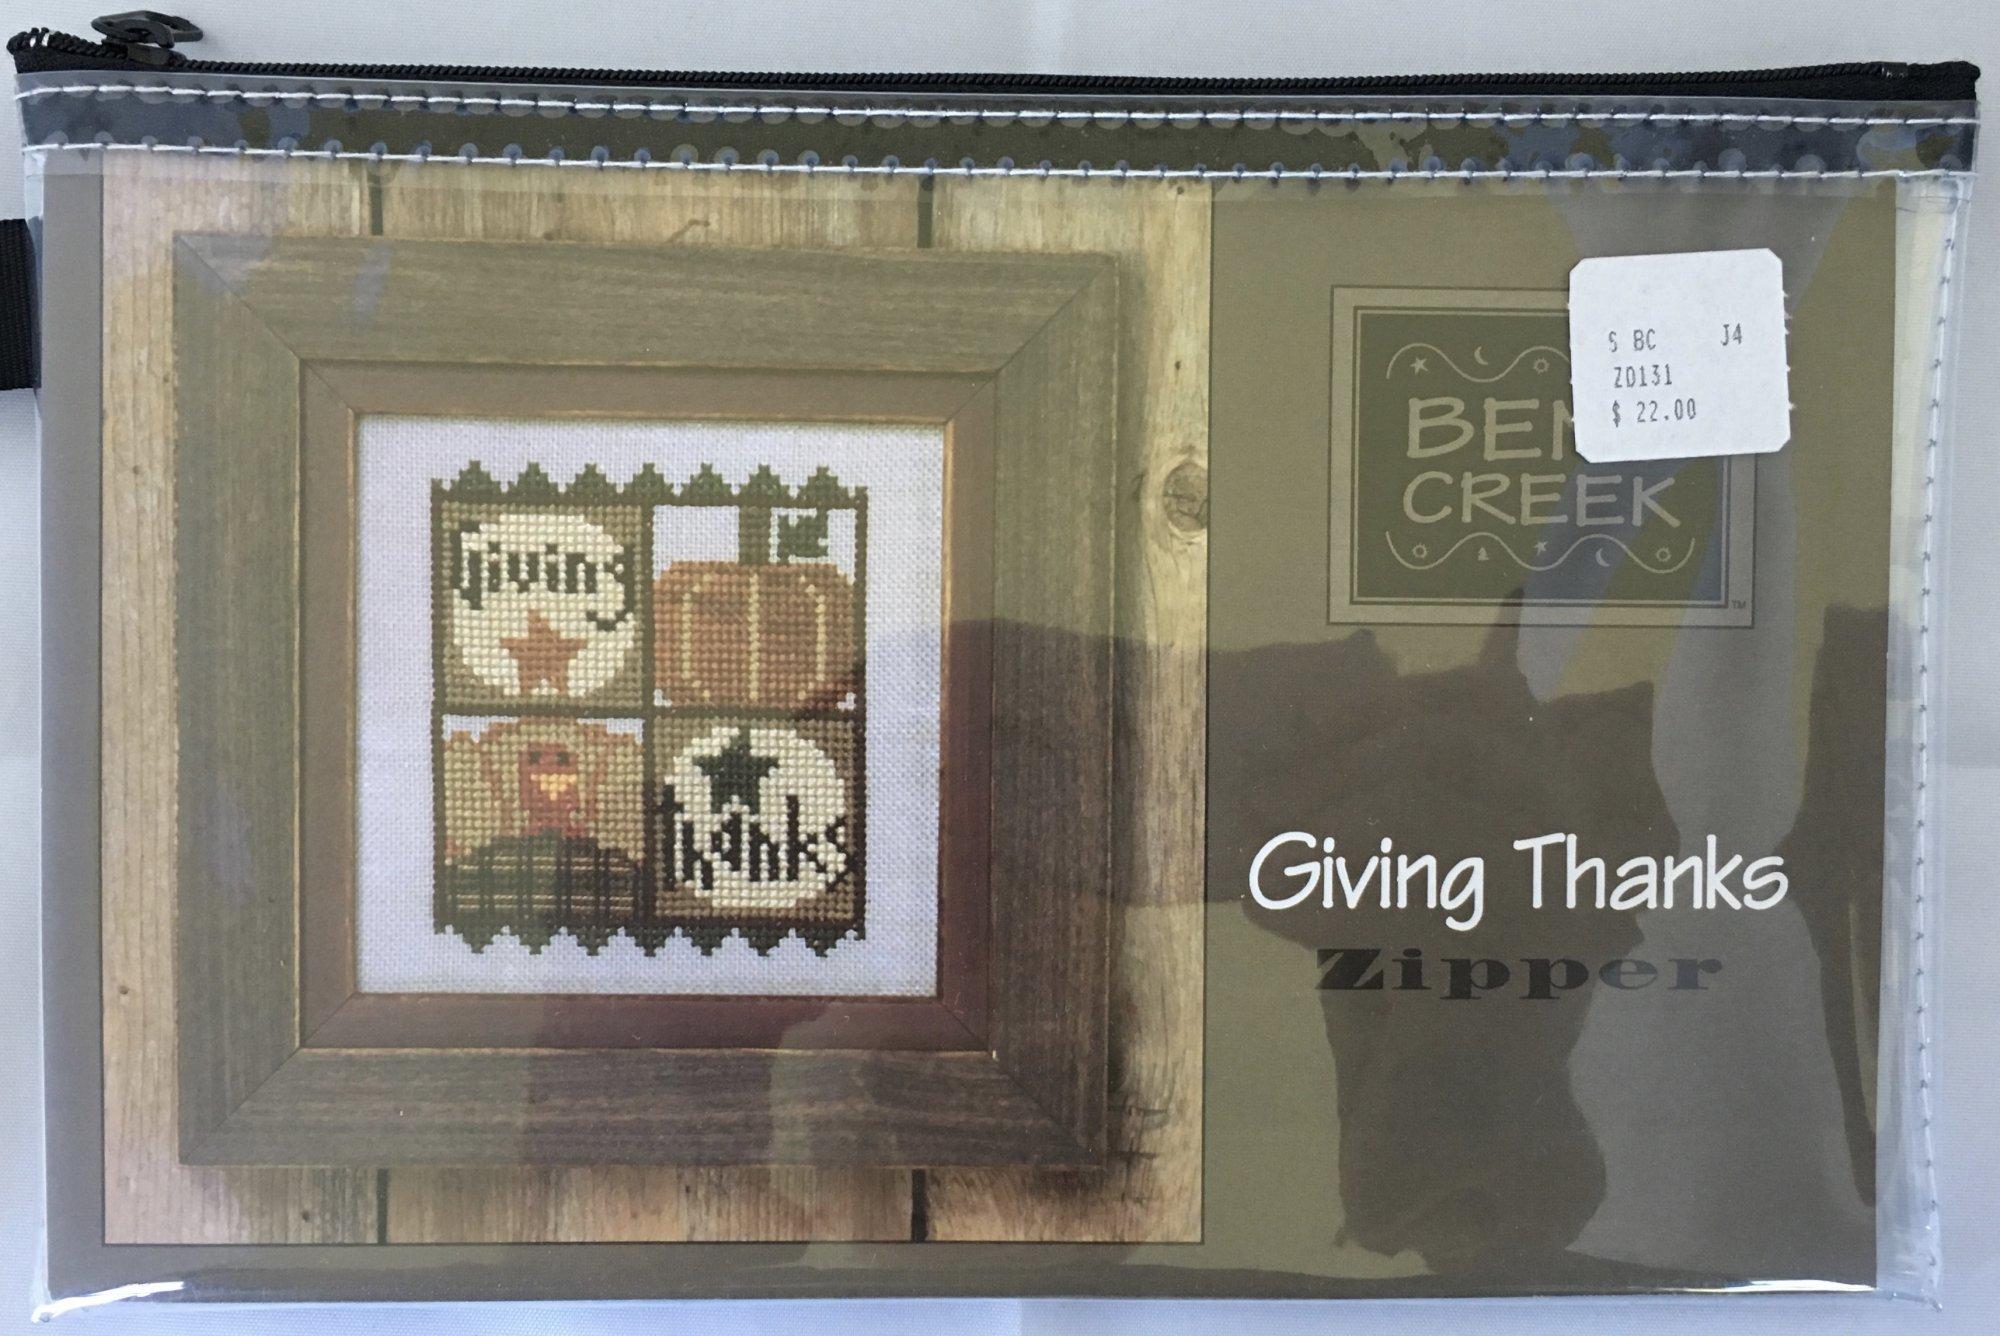 Bent Creek: Giving Thanks Zipper Kit